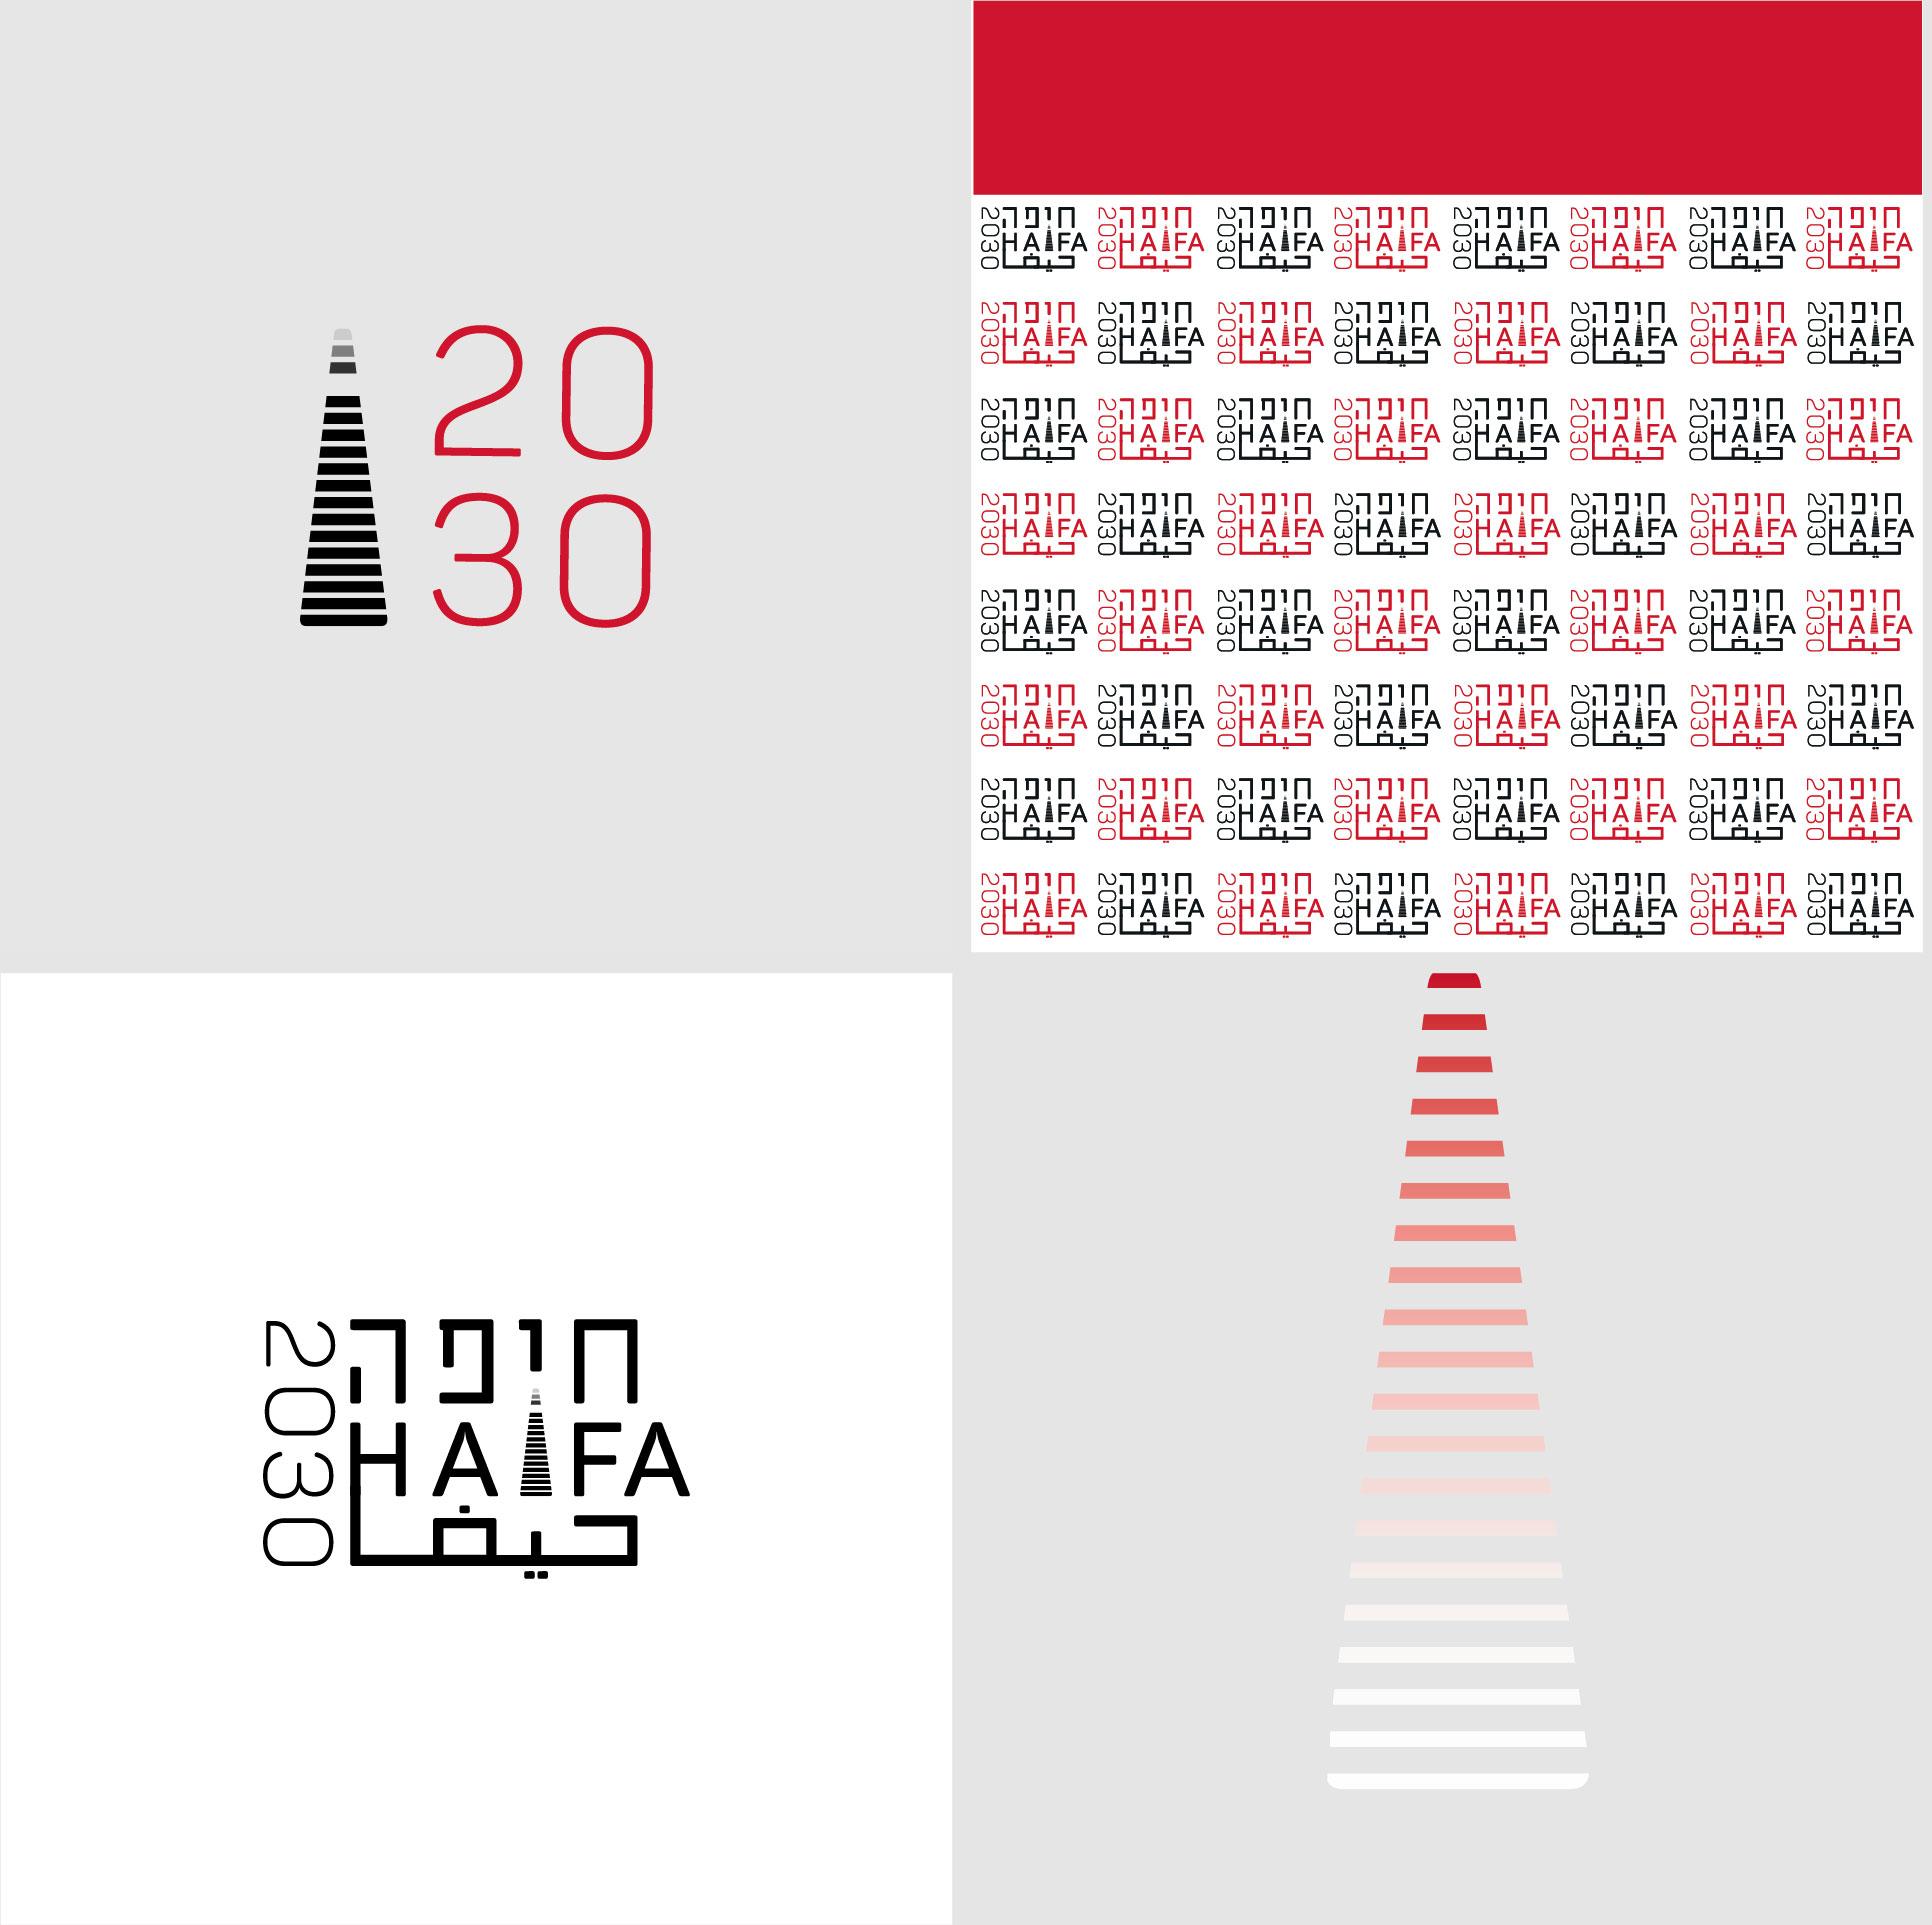 graphic design agency haifa2030 gili barshay